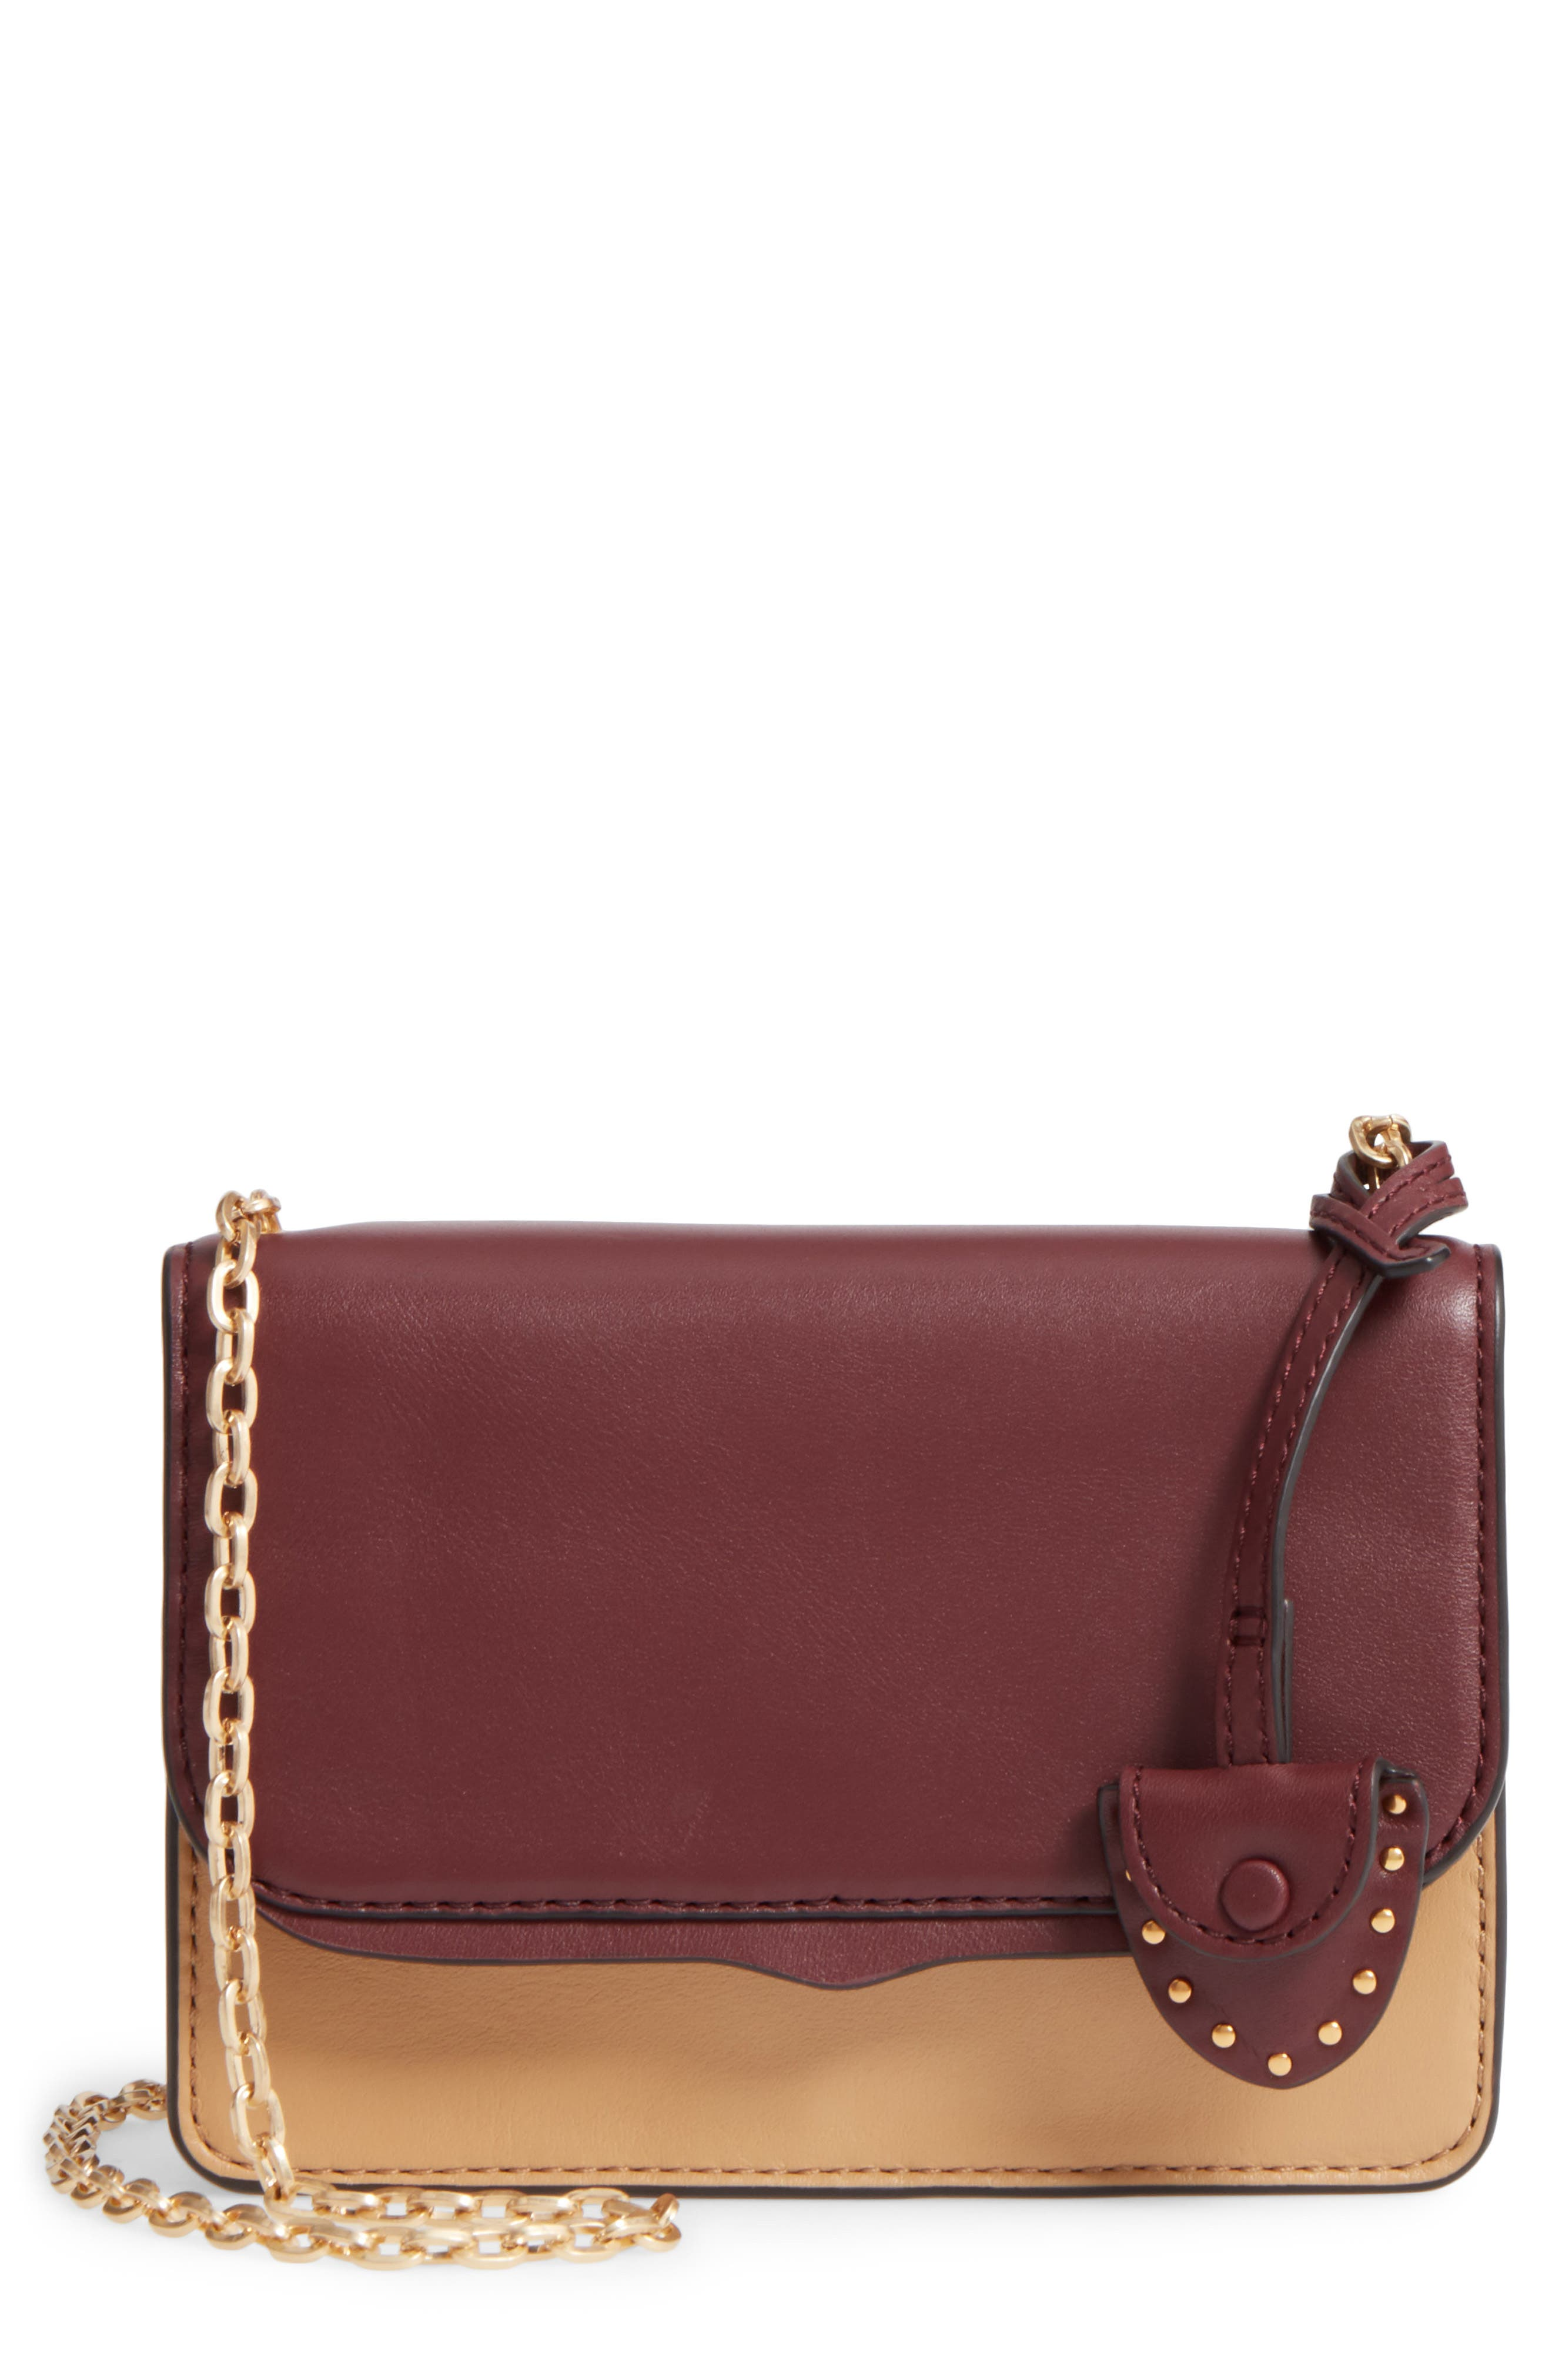 Mini Chain Leather Crossbody Bag,                             Main thumbnail 1, color,                             600